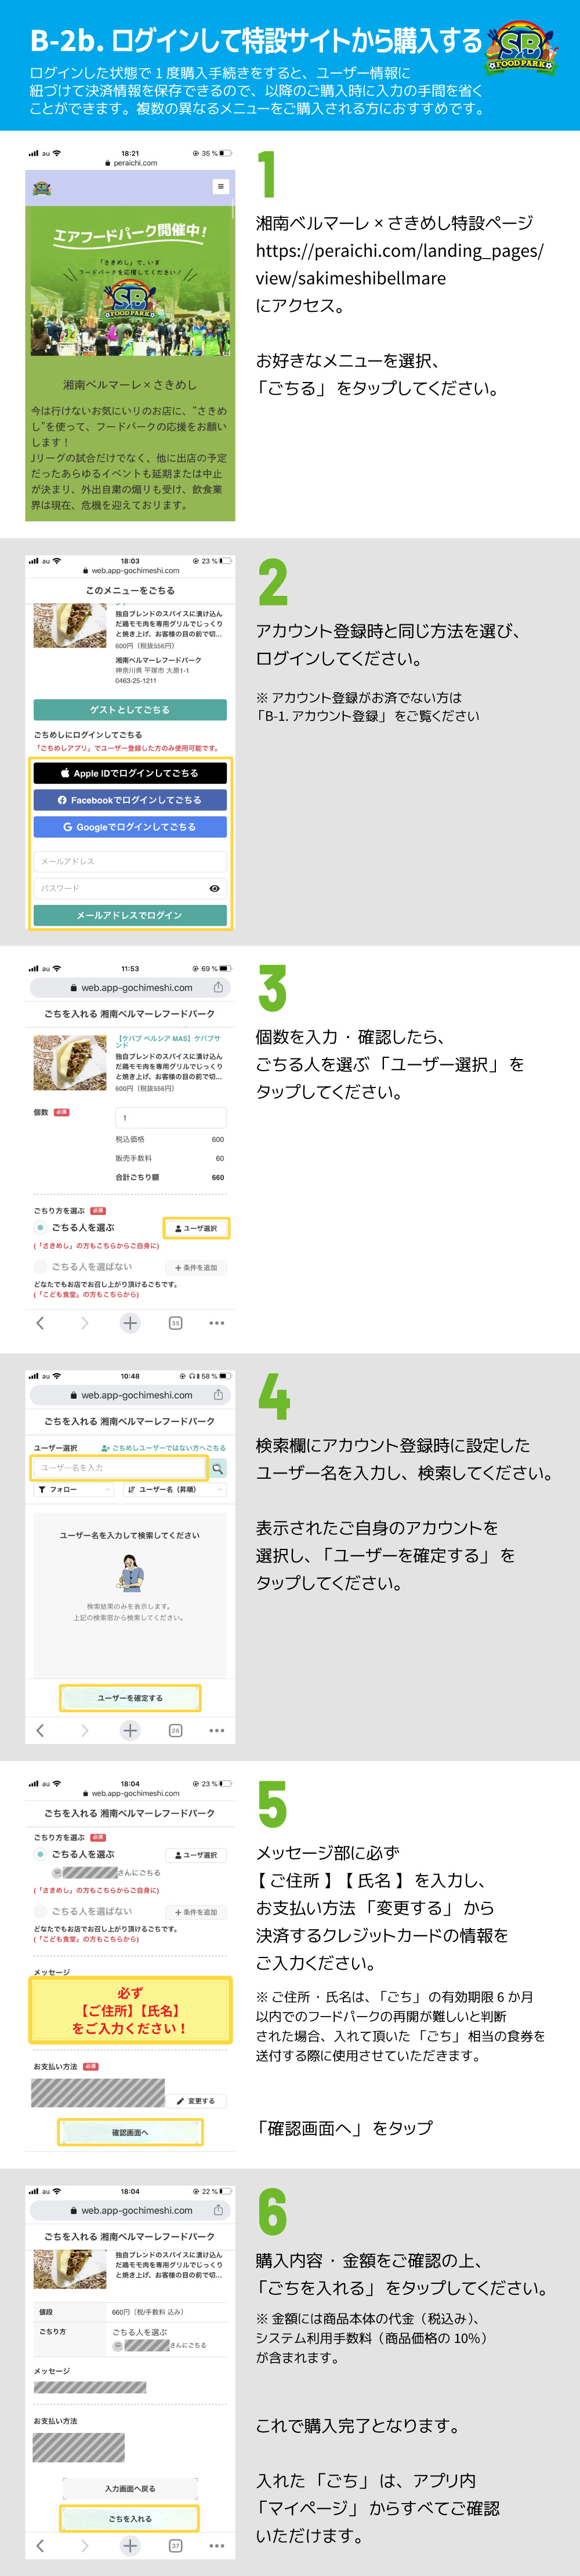 sakimeshi_purchase_web